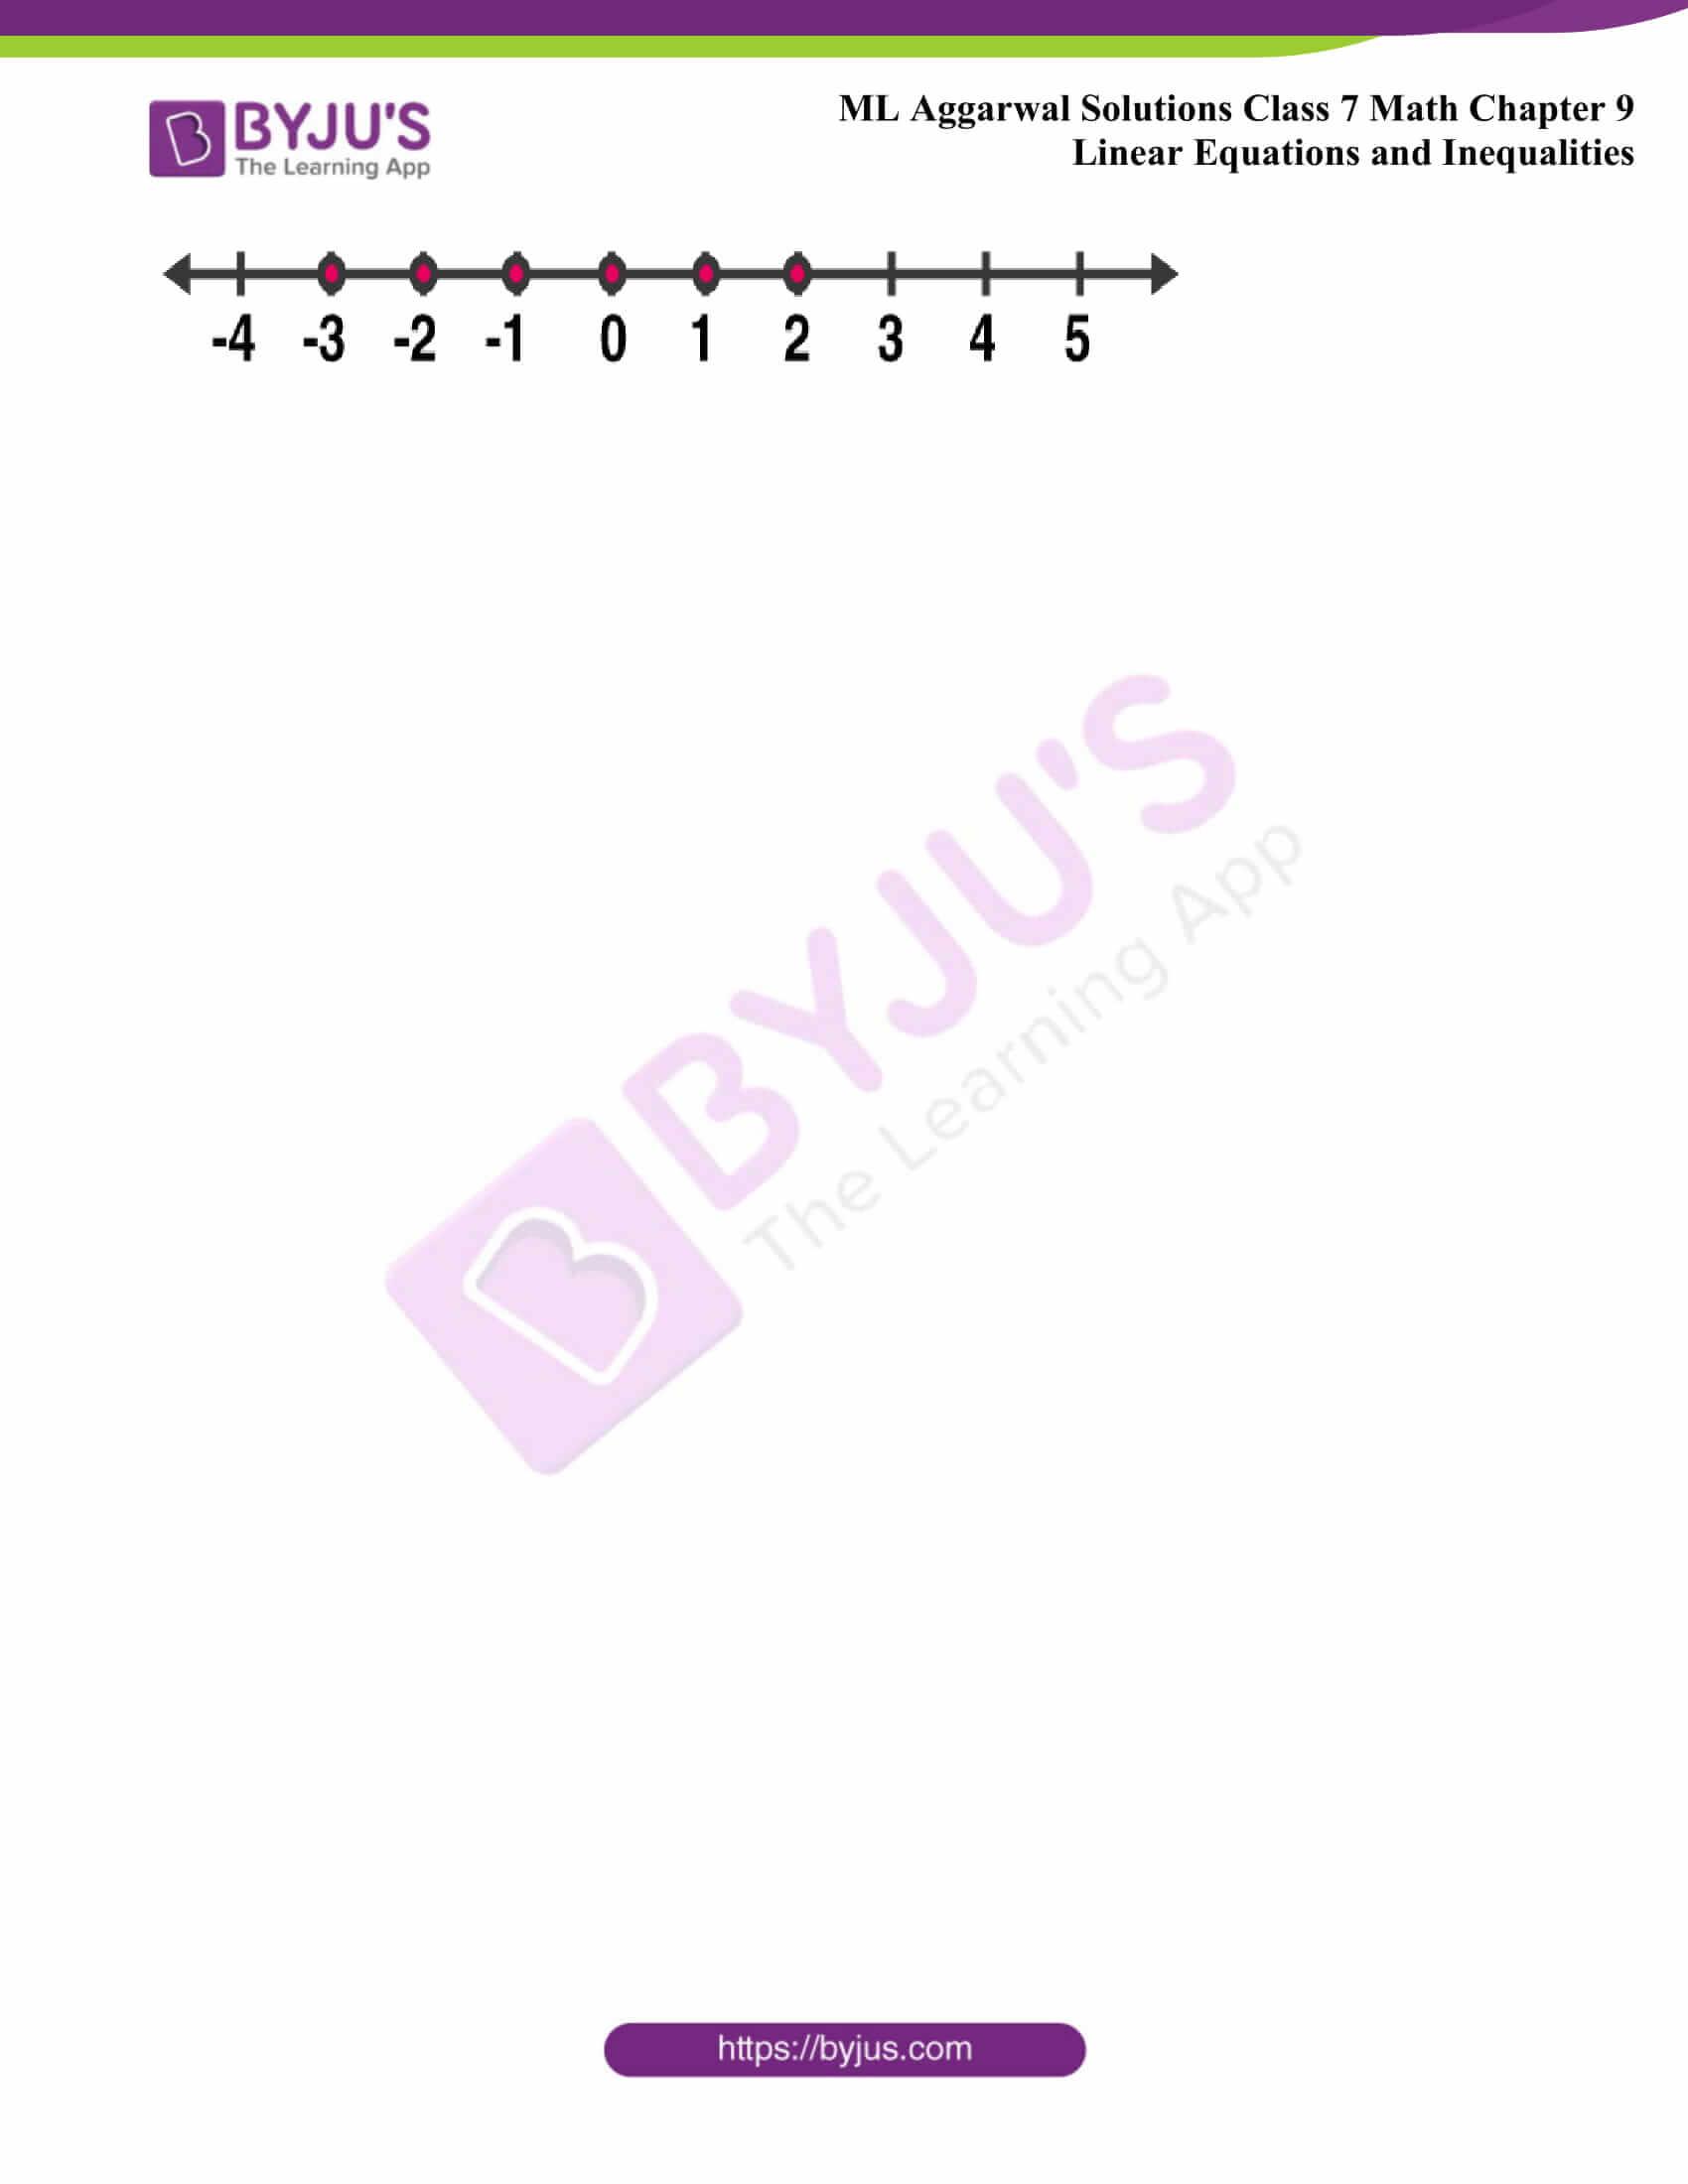 ml aggarwal sol class 7 maths chapter 9 5